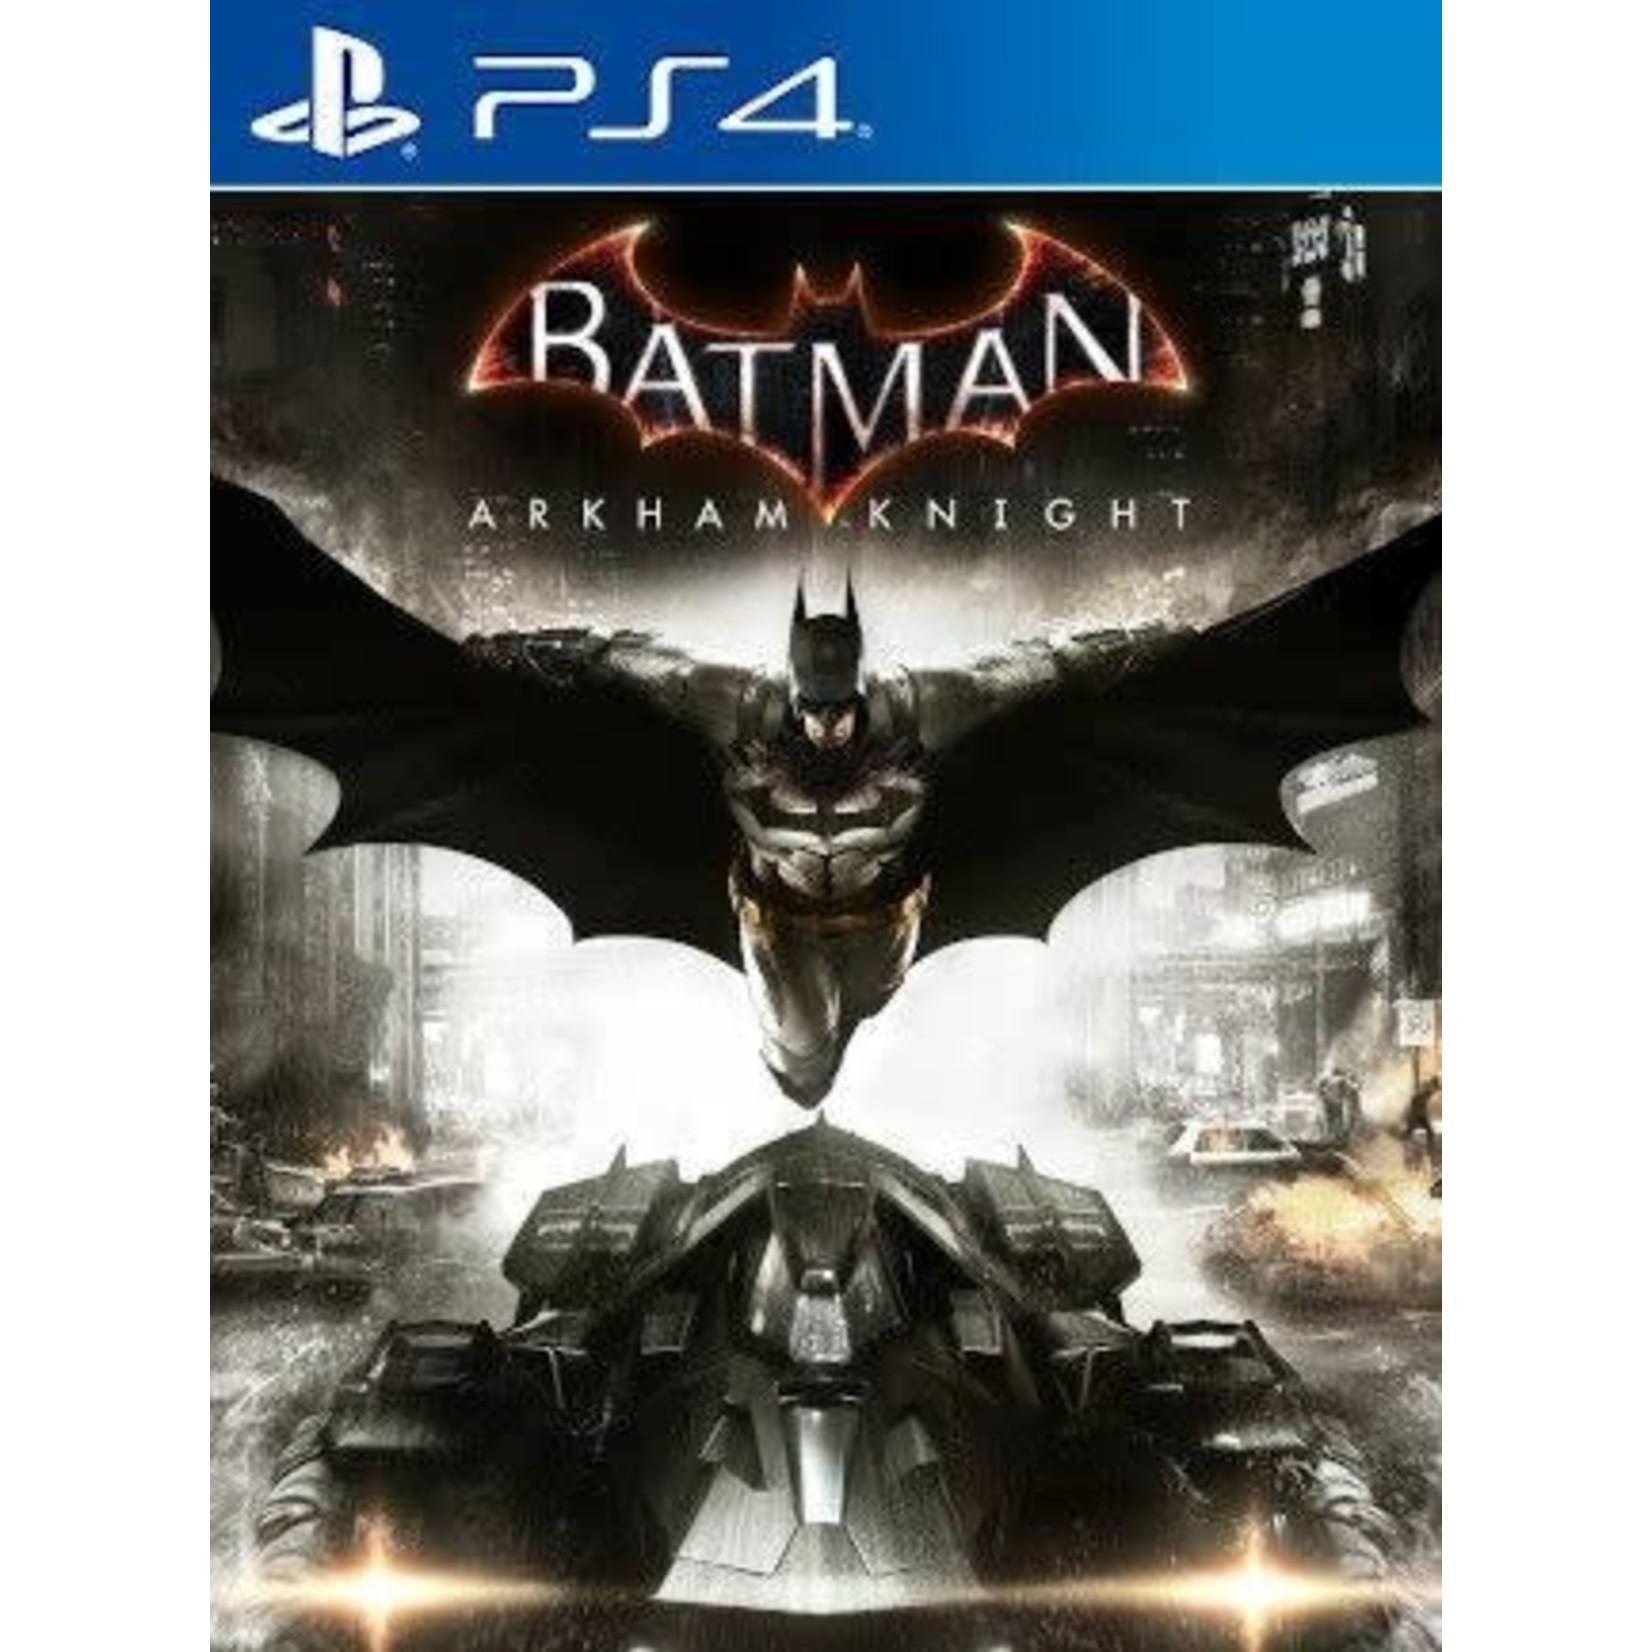 PS4-Batman: Arkham Knight